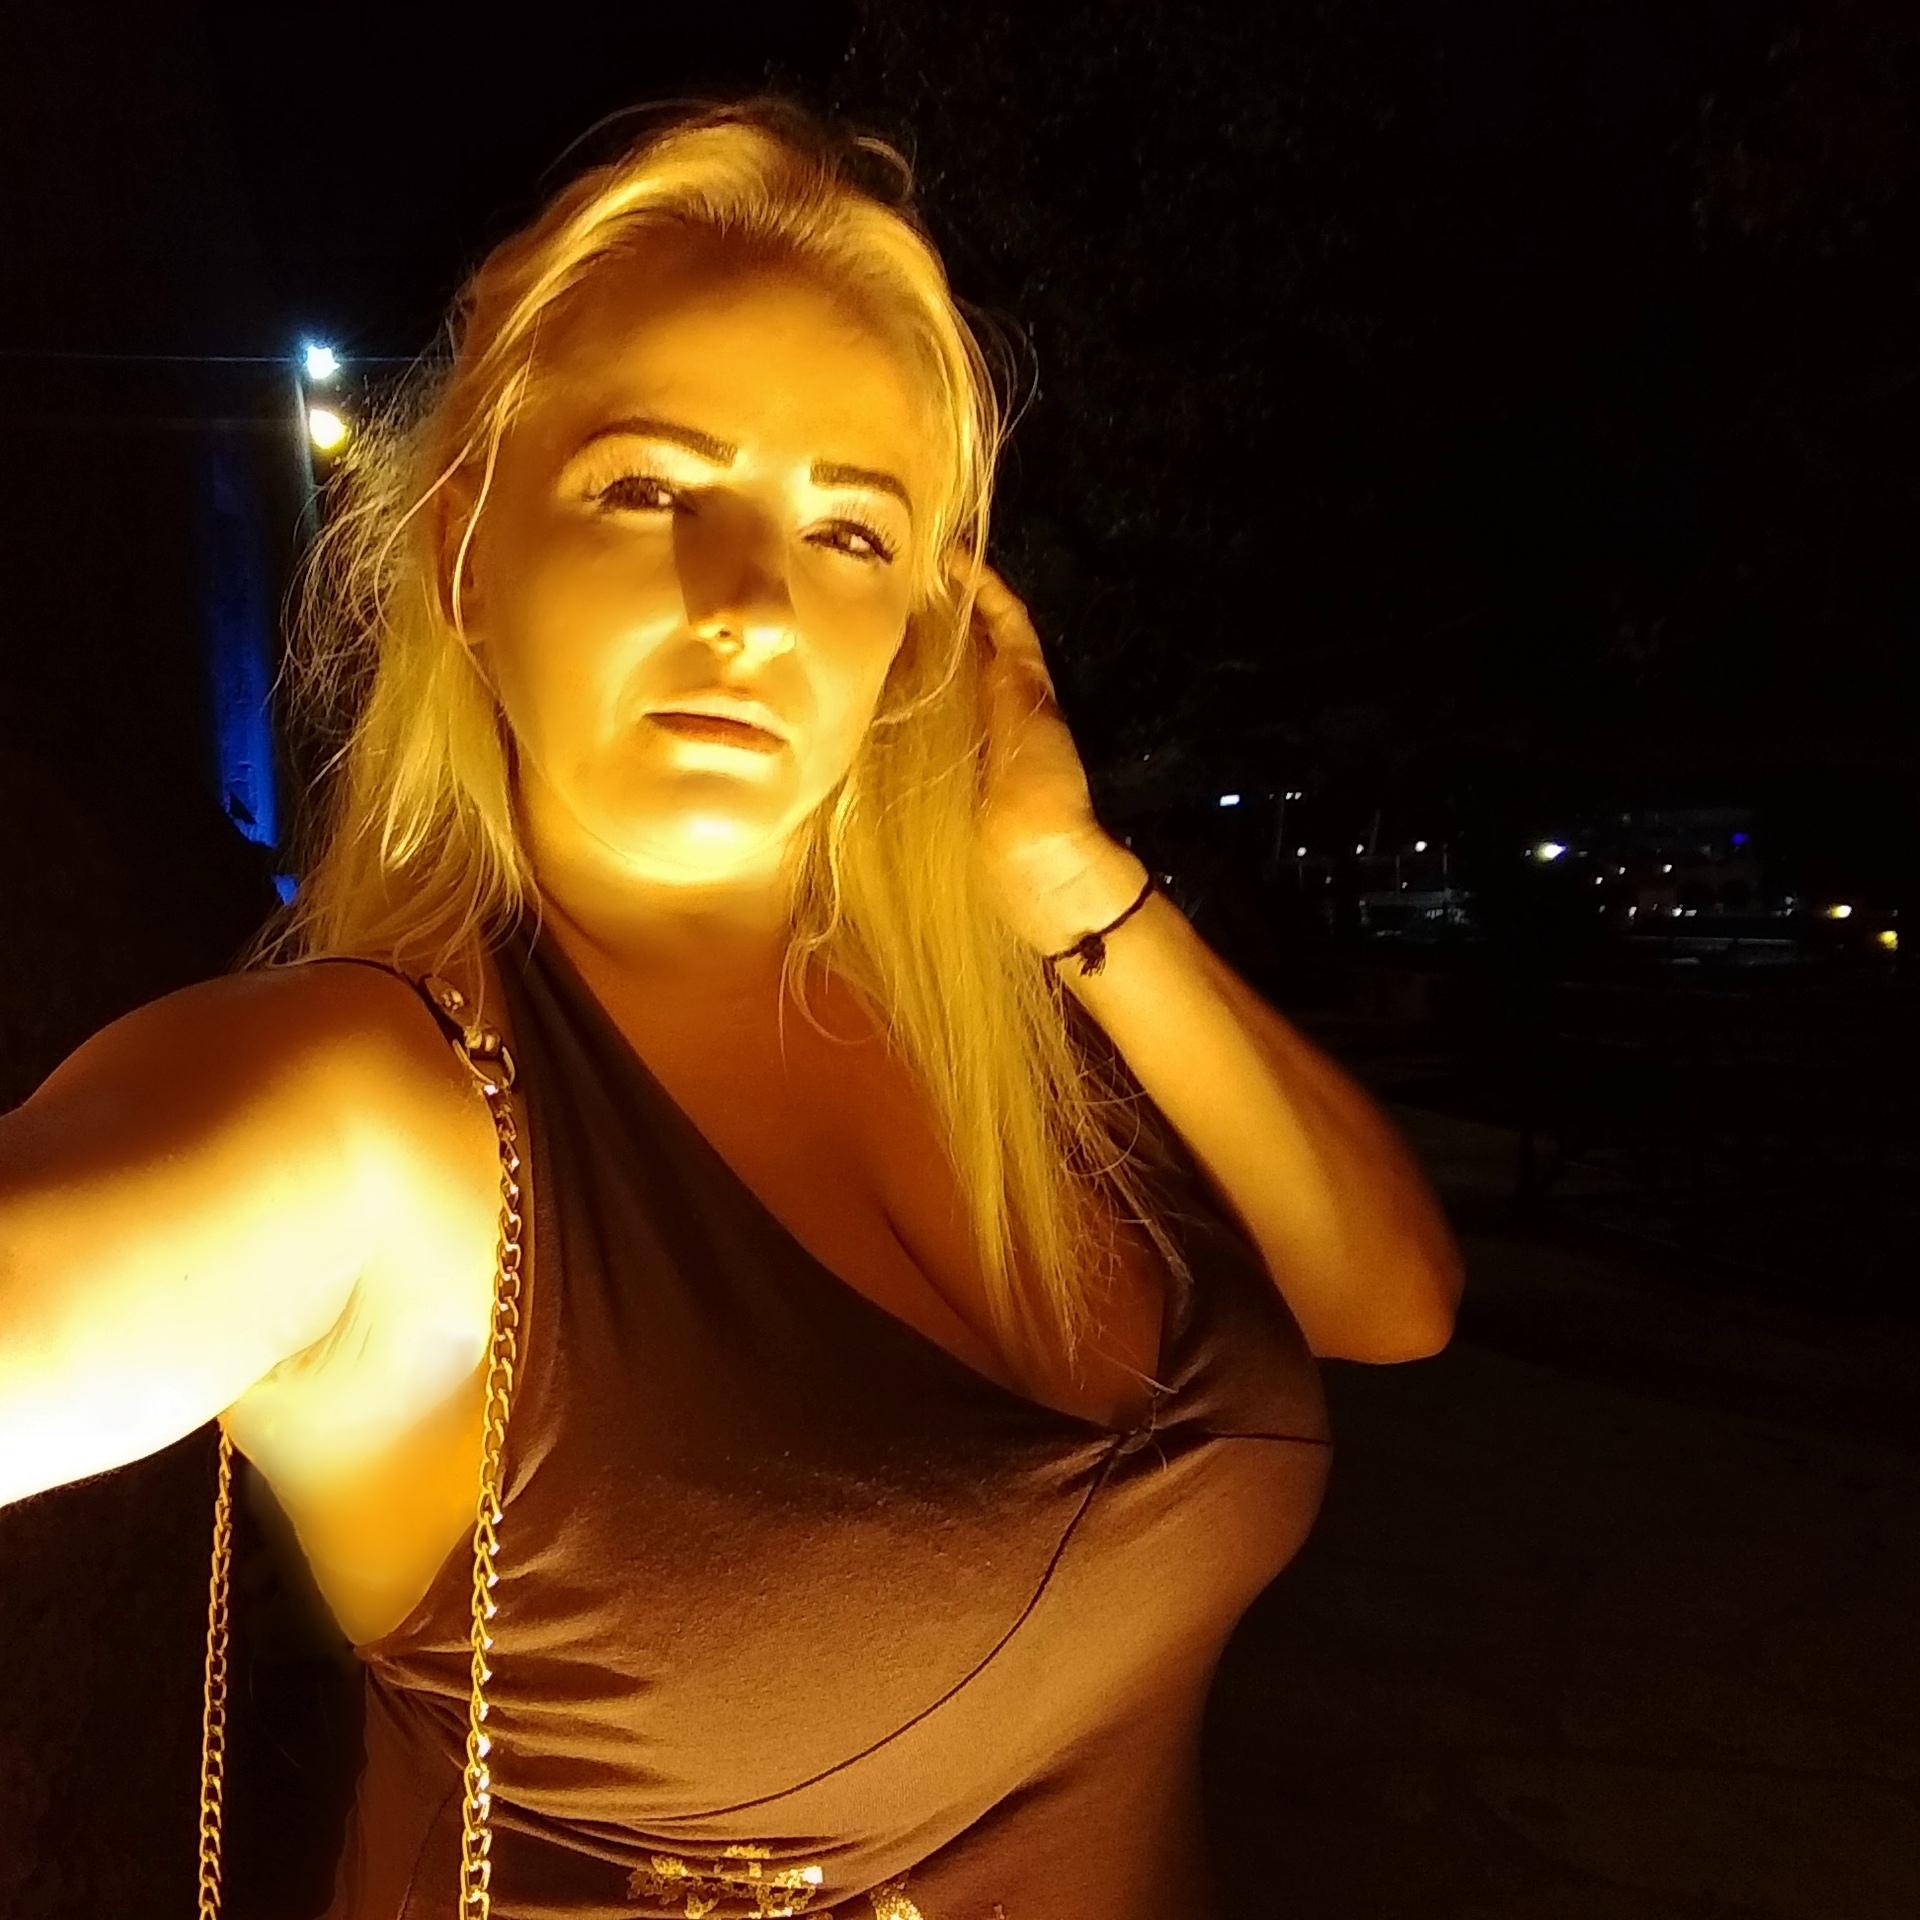 Елена Руденко (Валтея). Кипр. Айия-Напа (фото). - Страница 6 ZJENnN-wMLY